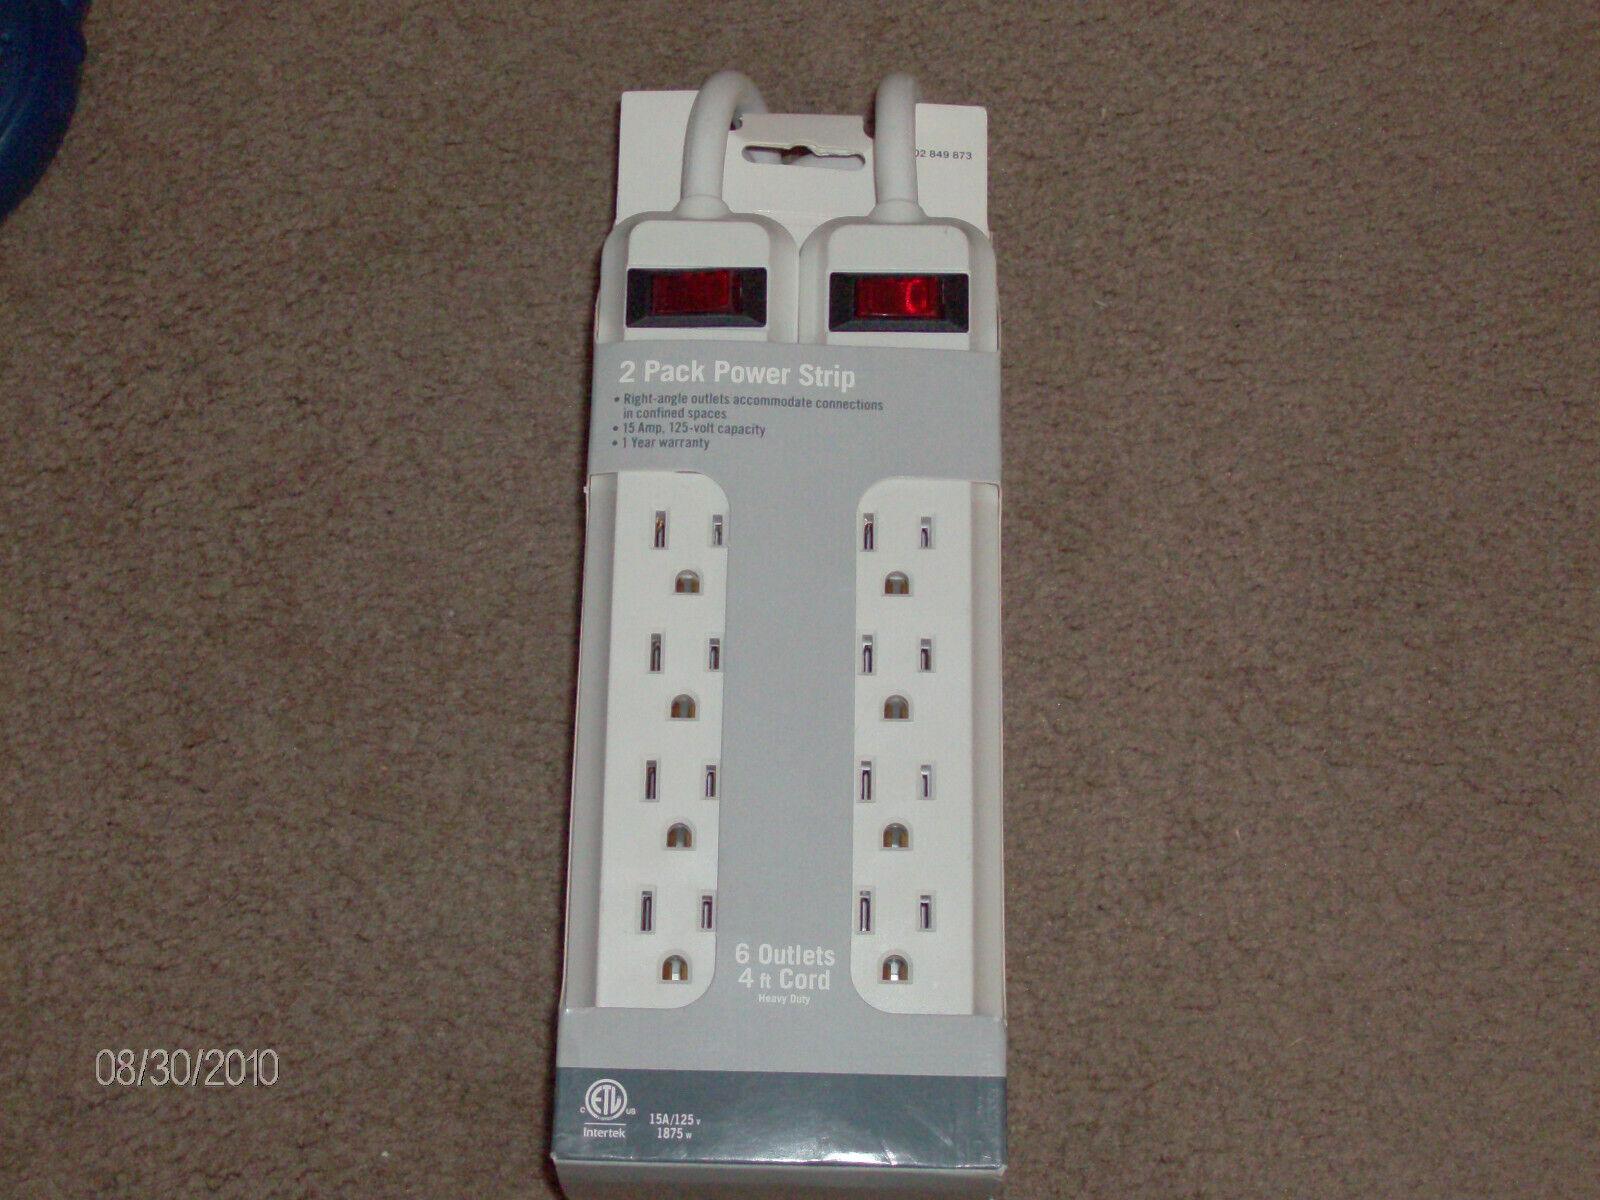 Power Strip! Brand NEW 2 Pack Power Strip! 15amp 125 volt! 6